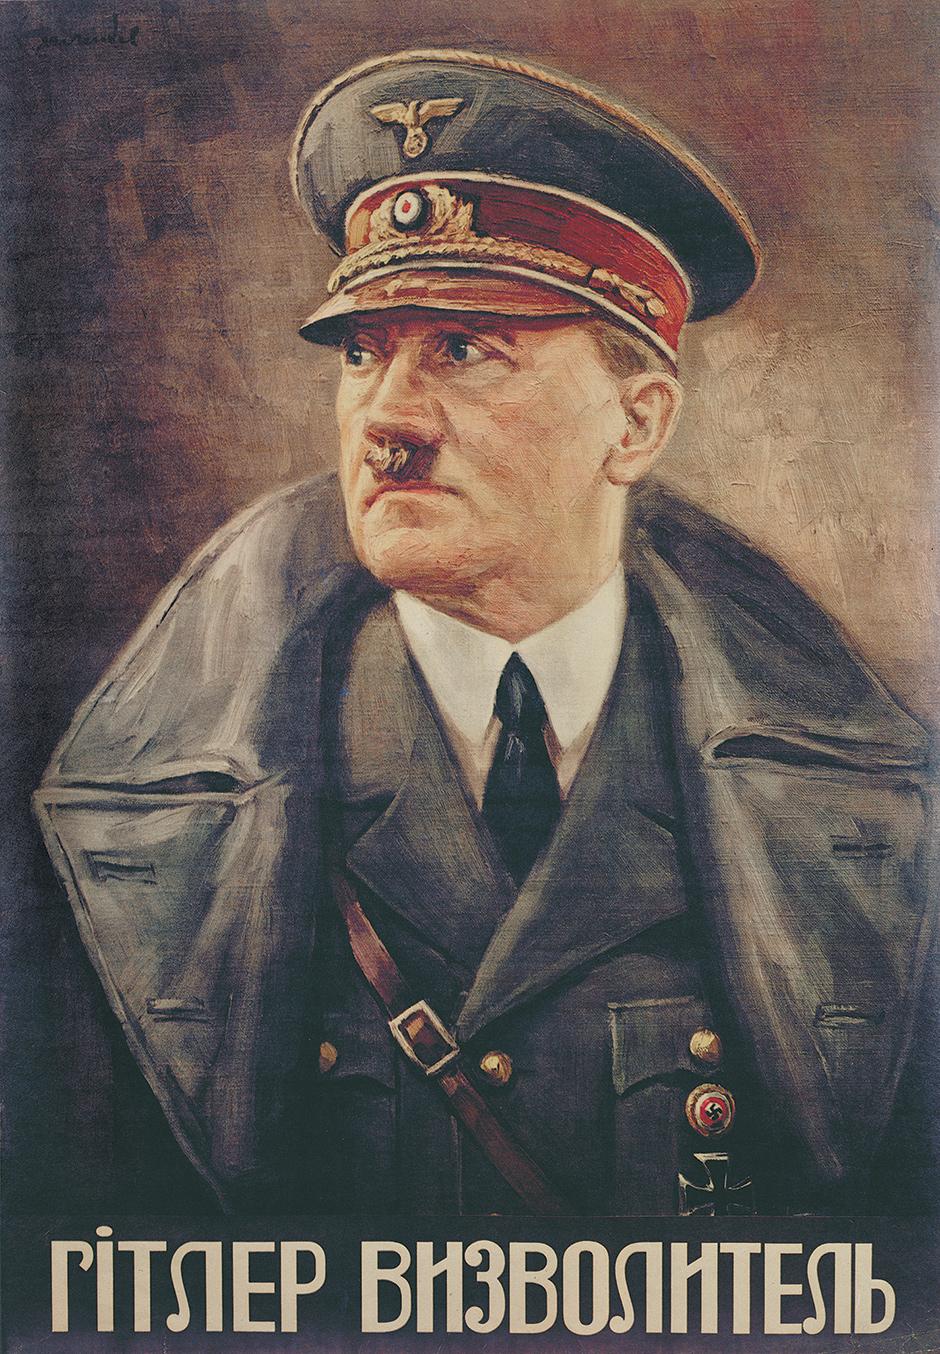 A Nazi propaganda poster with Ukrainian text that says 'Hitler, Liberator,' circa 1941